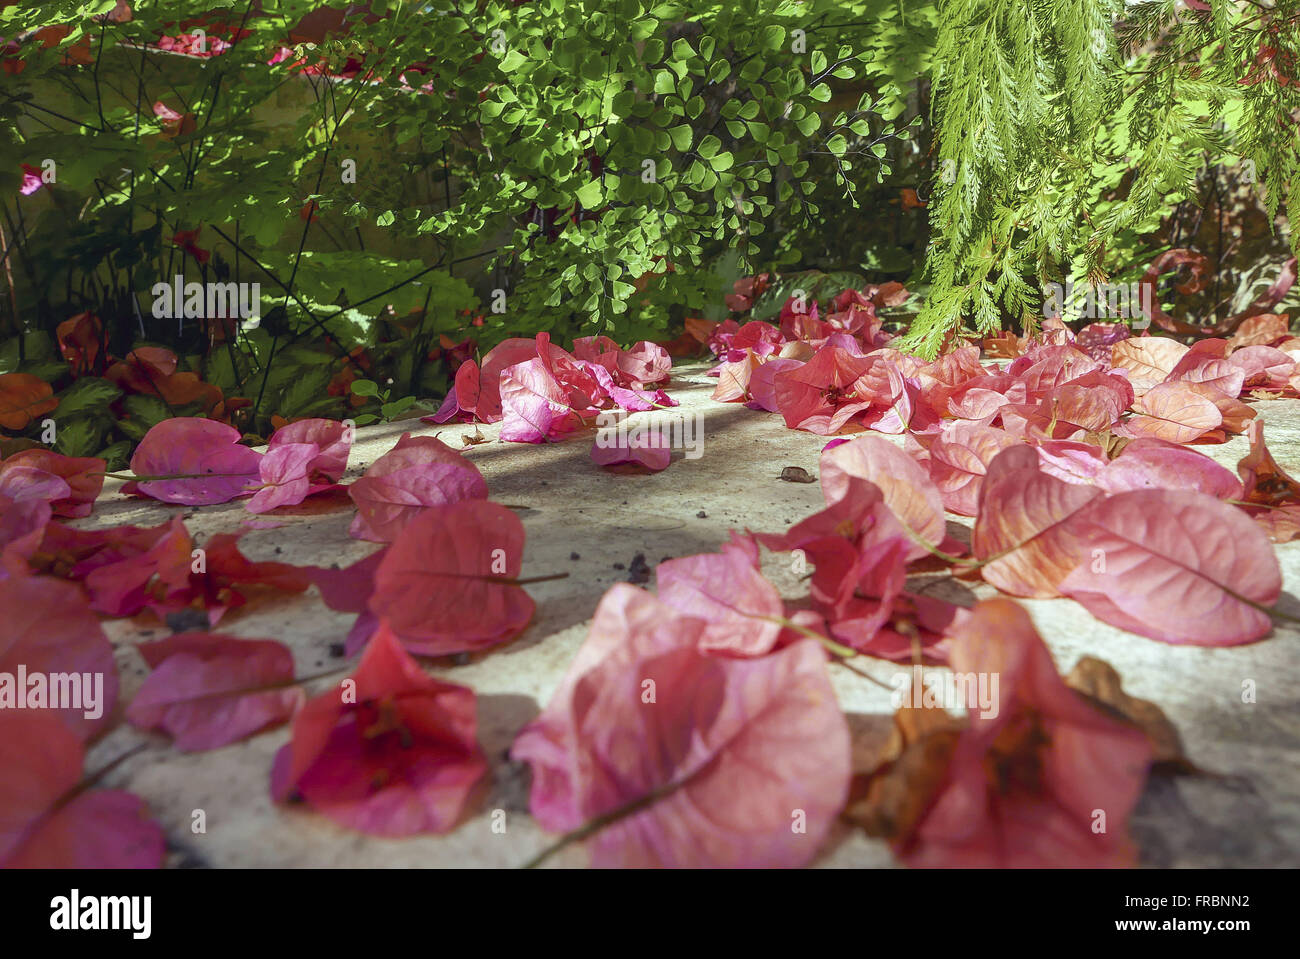 Petálas de primavera no Jardim de inverno de residência Immagini Stock